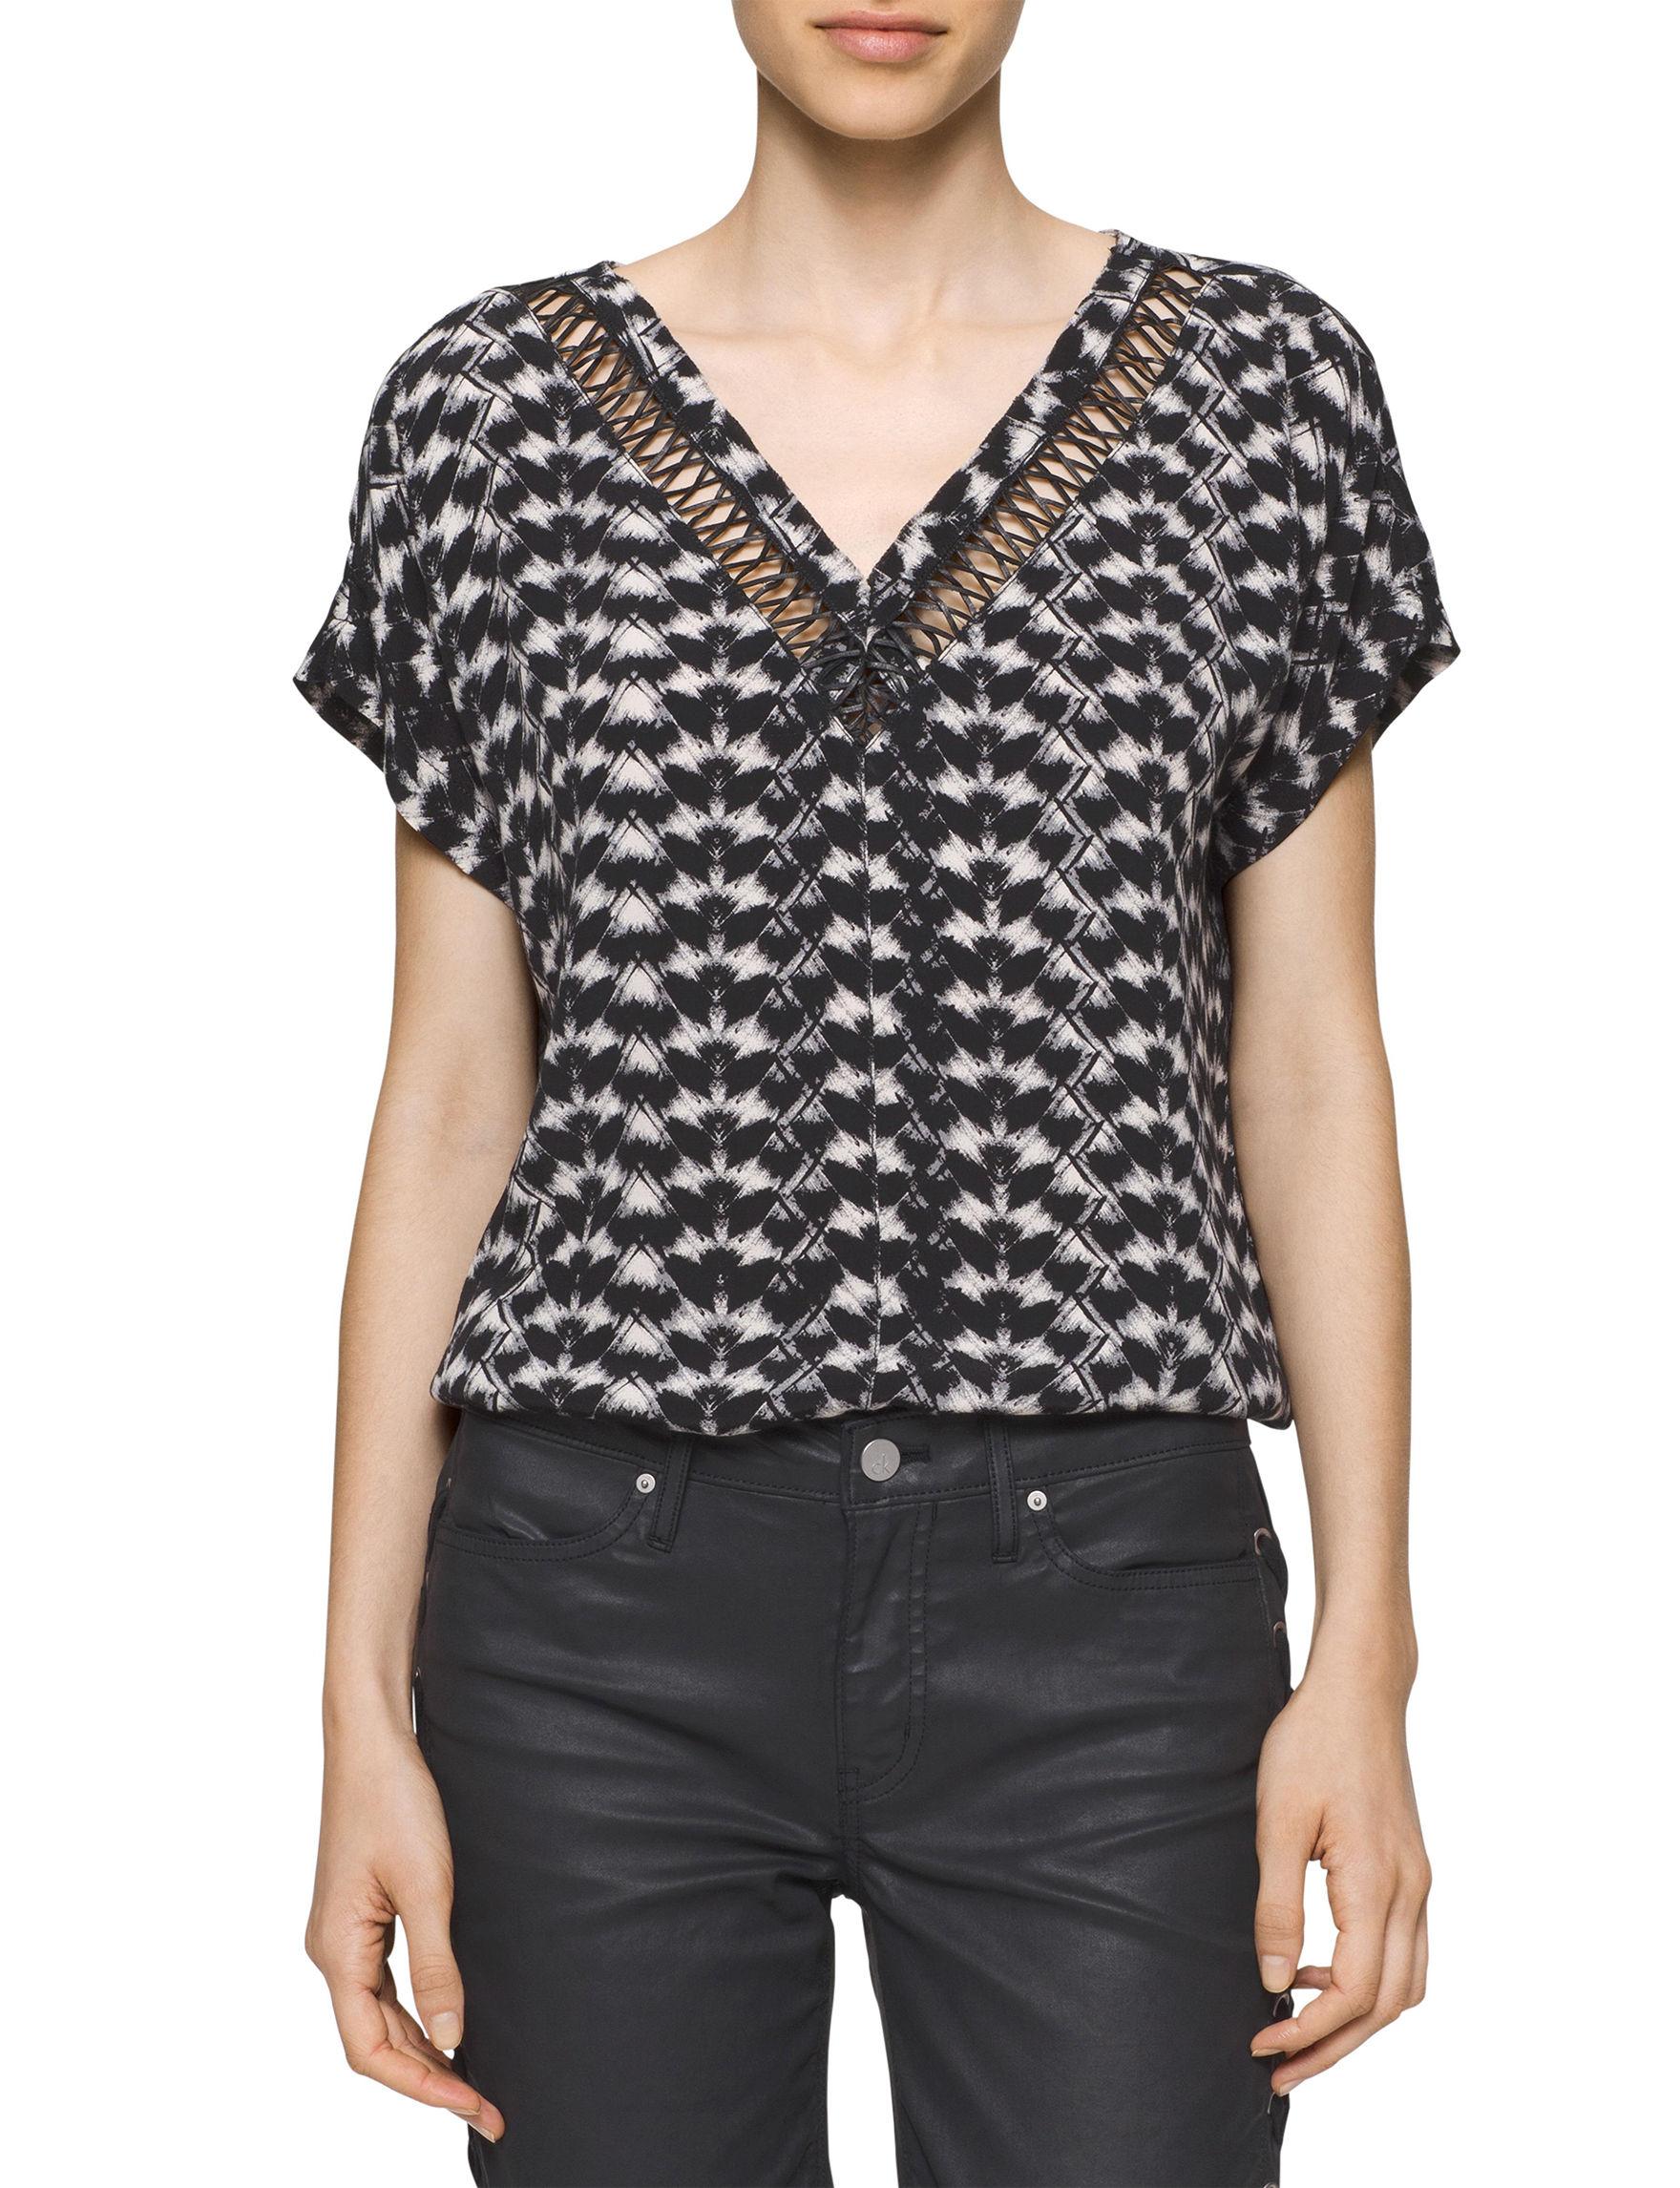 Calvin Klein Jeans Black Shirts & Blouses